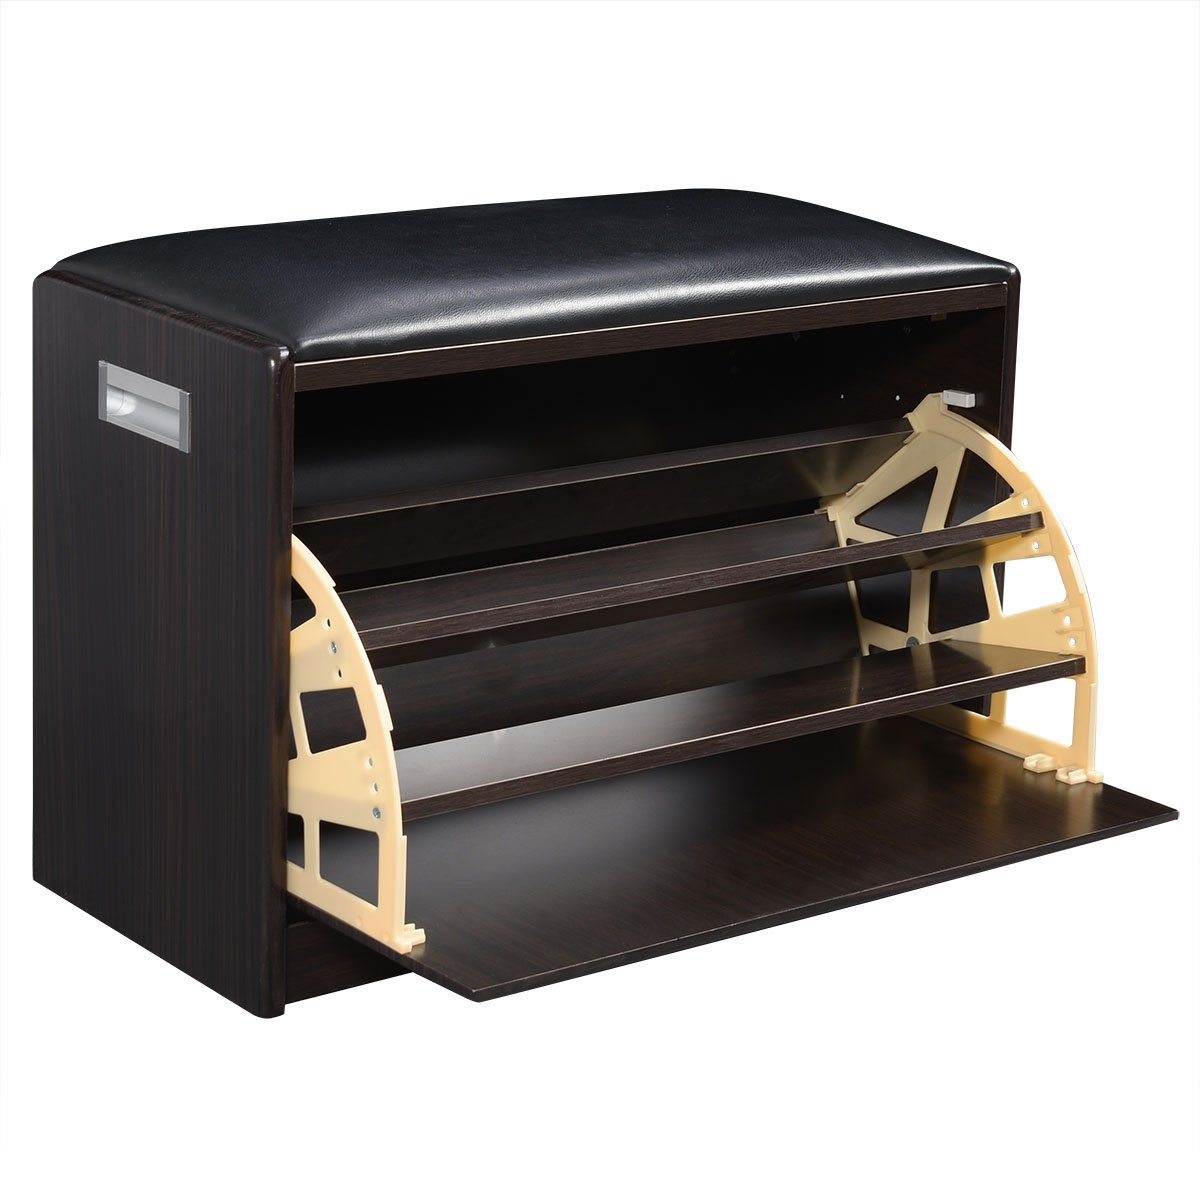 Giantex Wood Shoe Storage Cabinet Bench Ottoman Closet